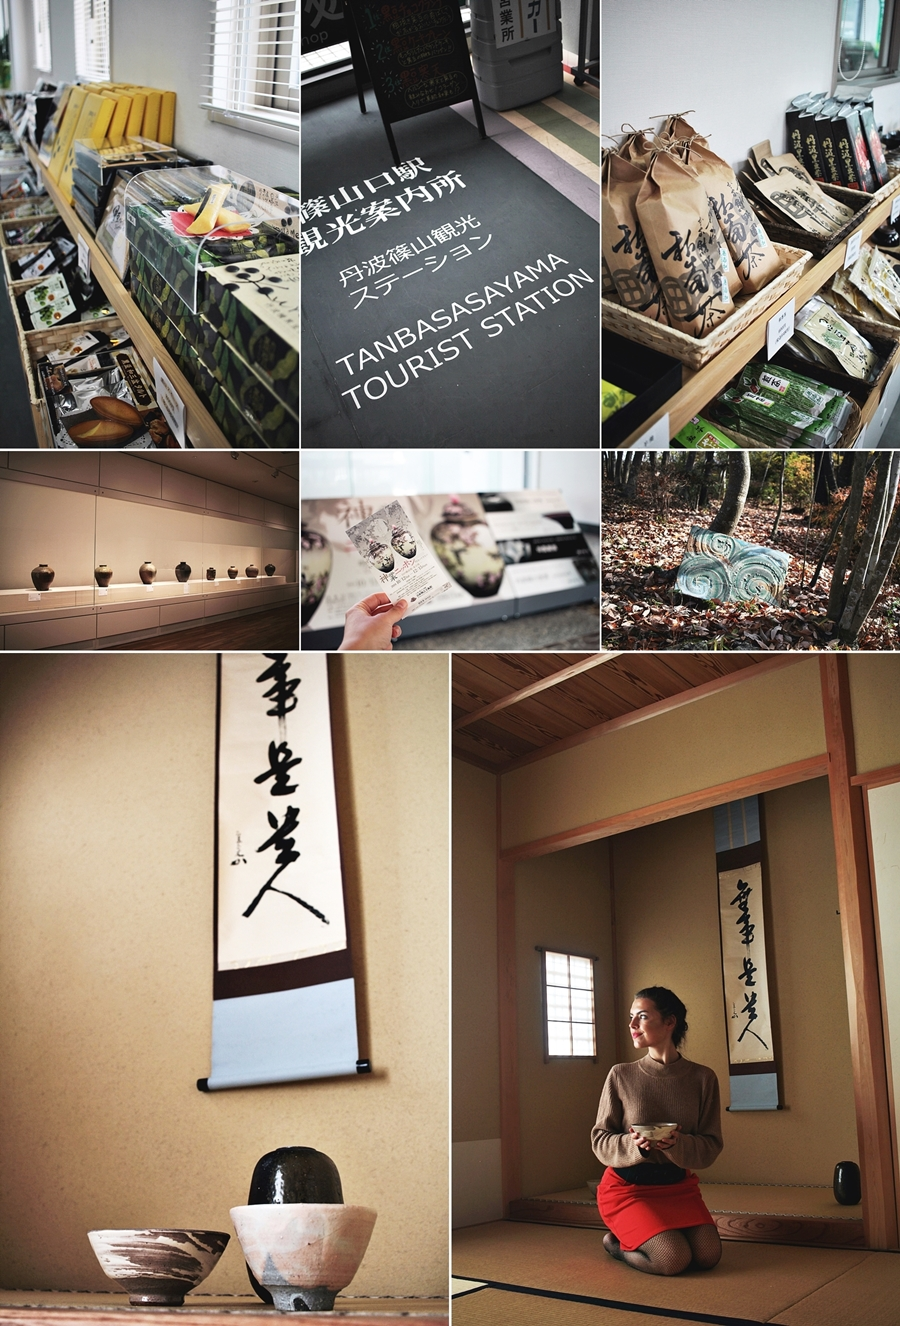 Museum of Ceramic Art, Hyogo and Tamba Traditional Art Craft Park. Tamba Pottery